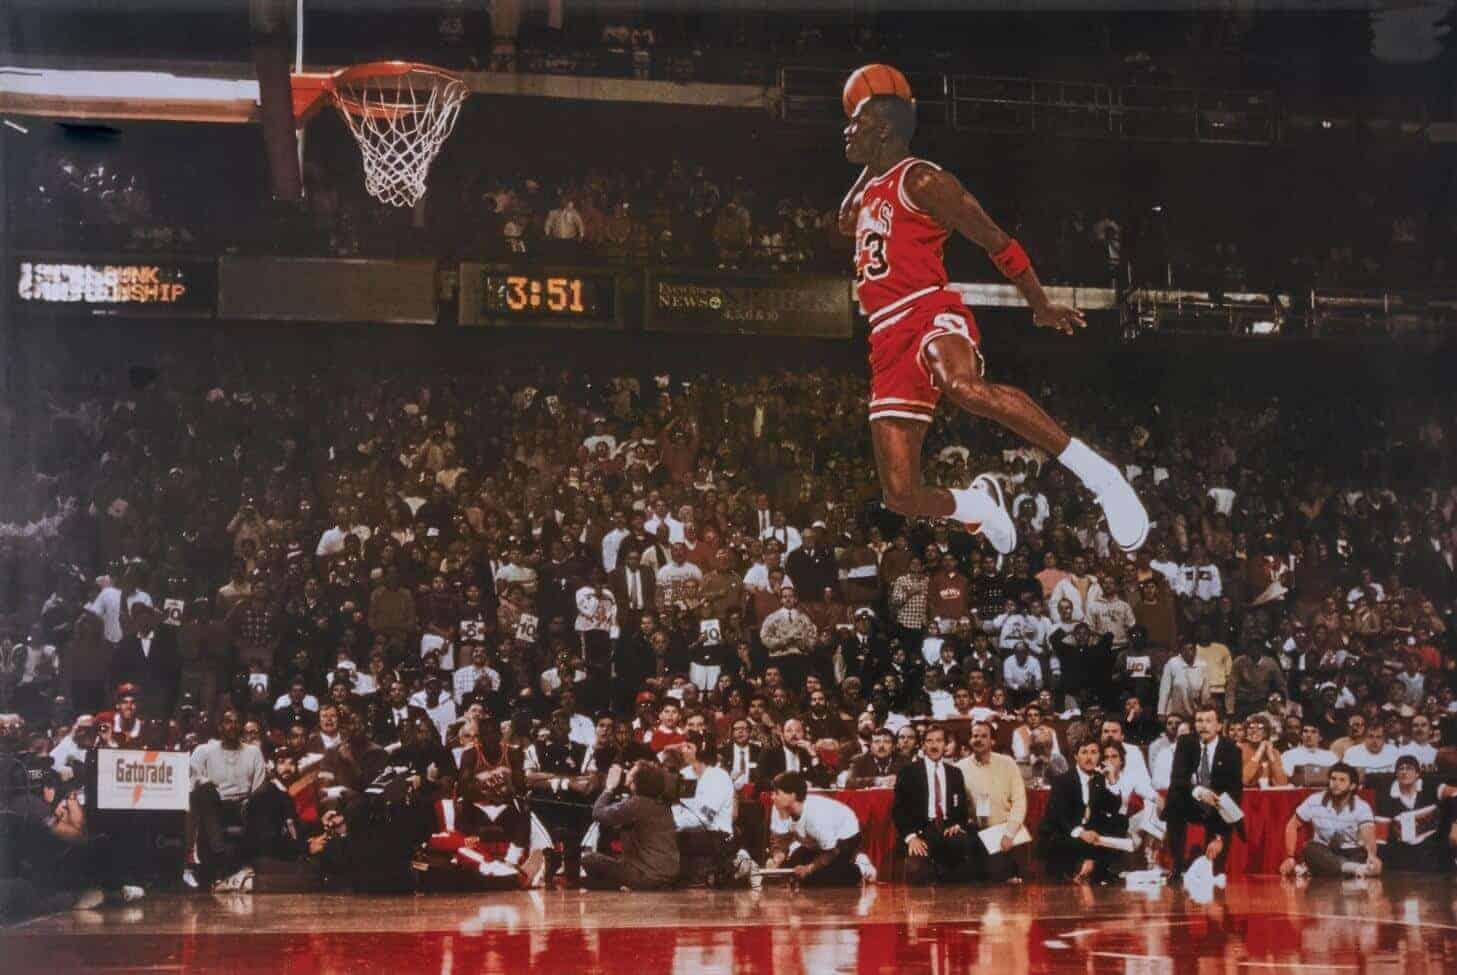 beroemde foto van Michael Jordan